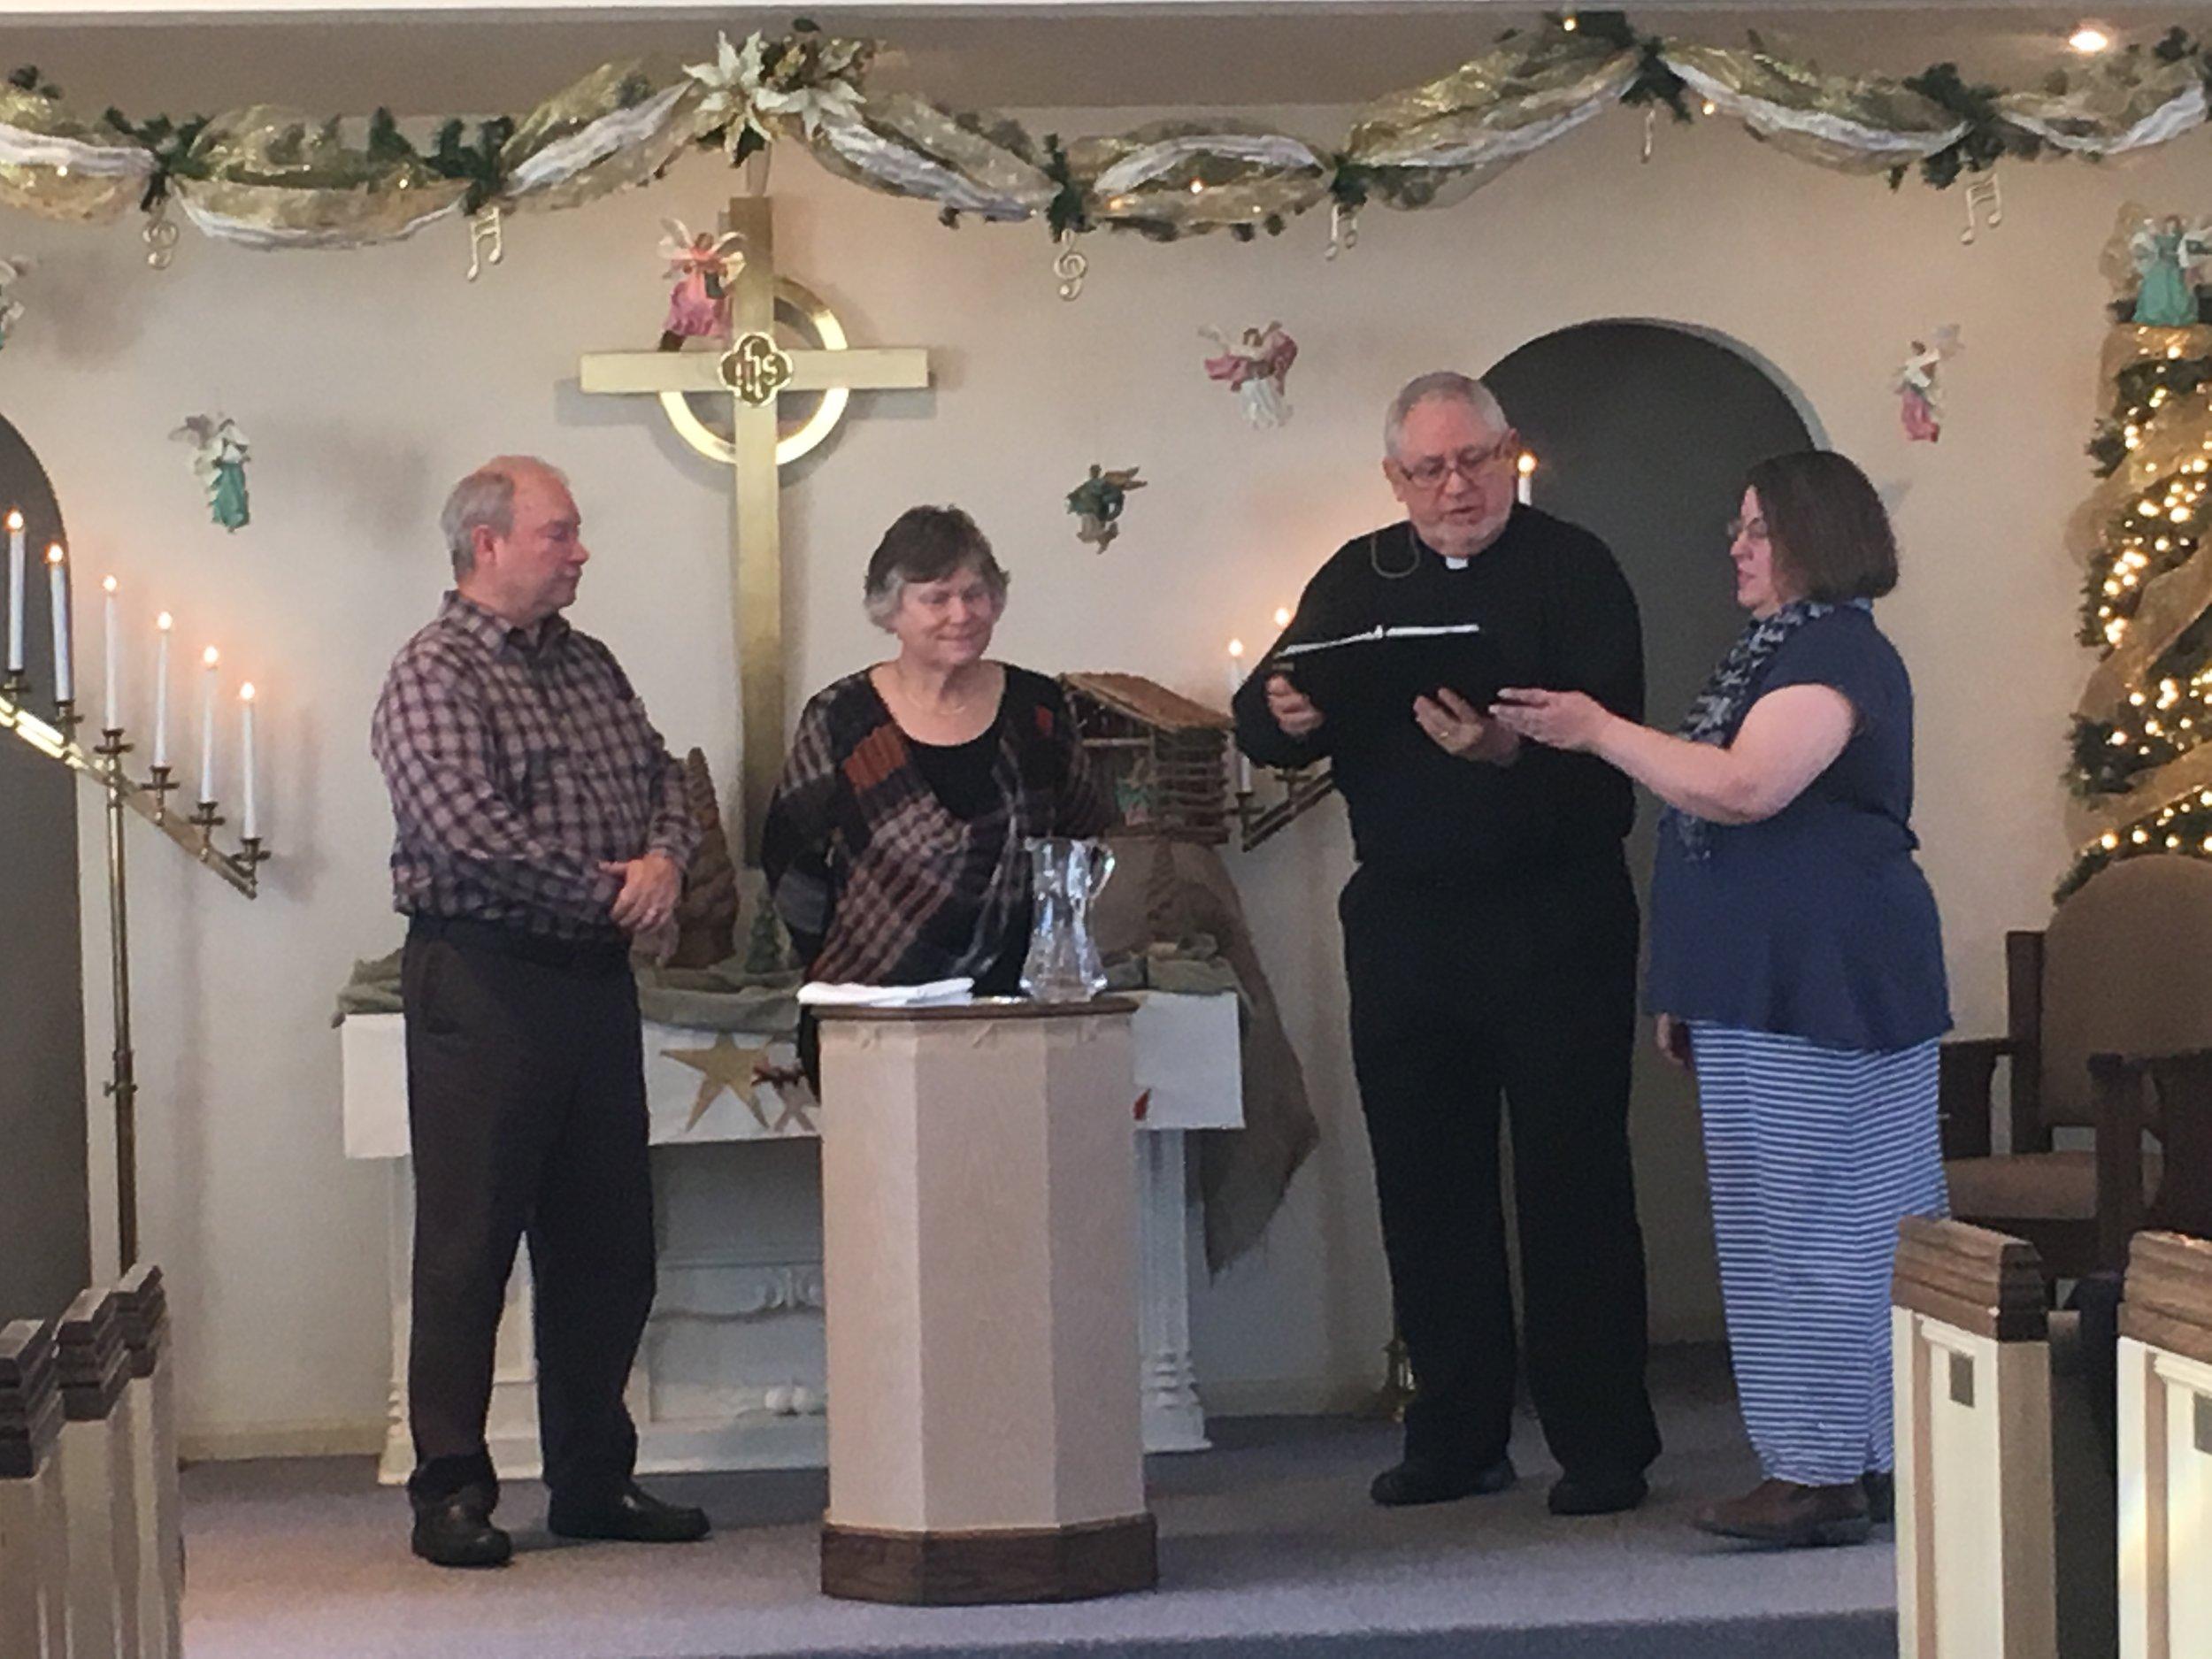 Larry Larsen & Penni Deshaw - New Church Members - December 3, 2017